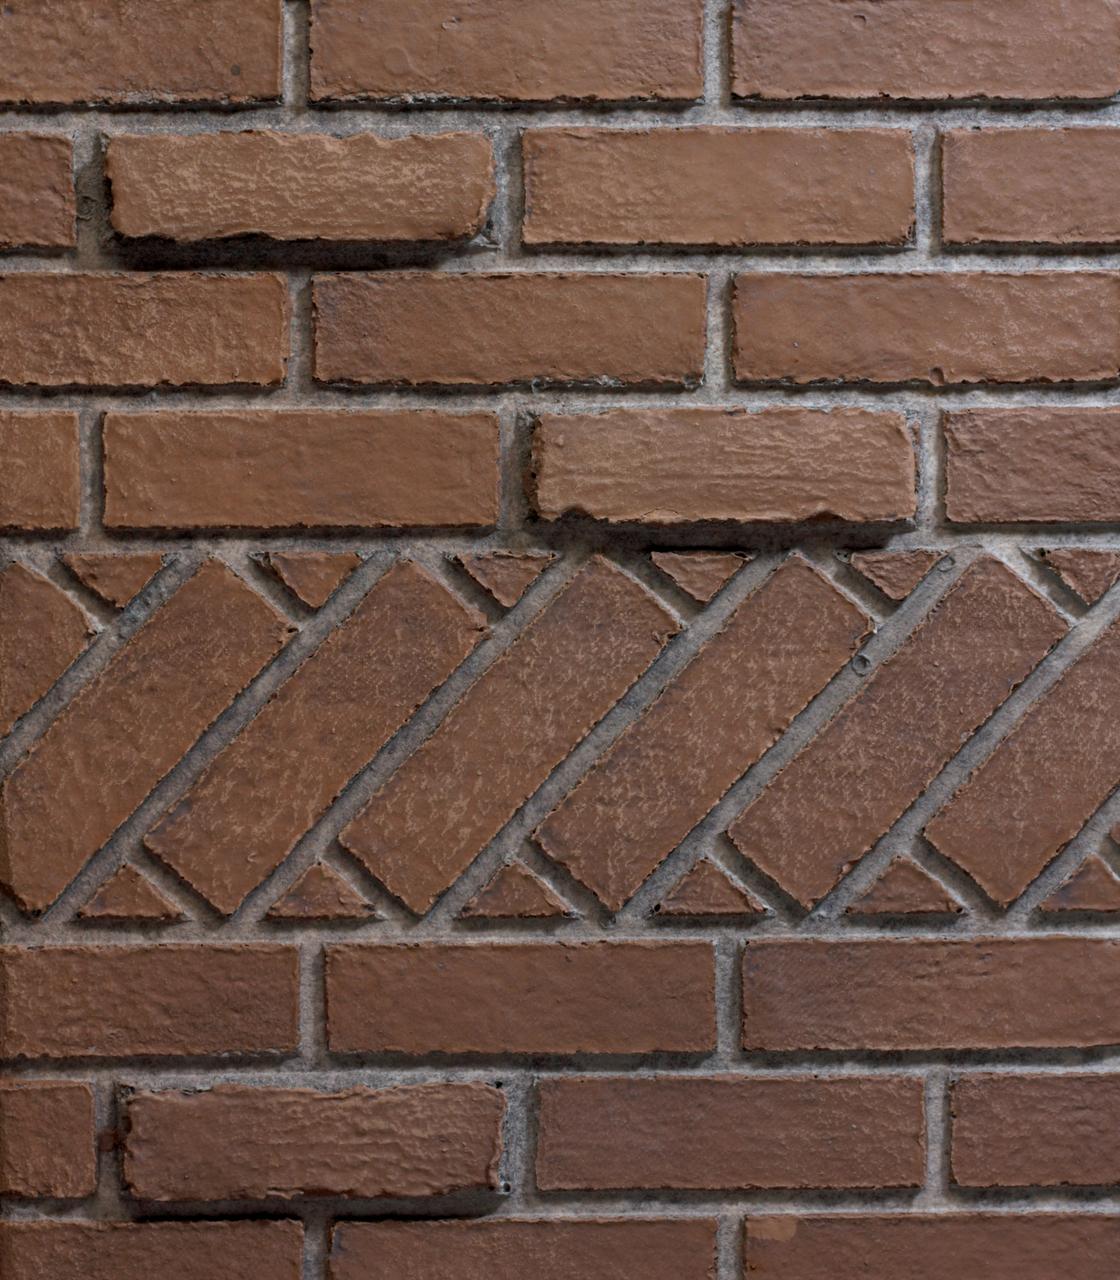 White Mountain Hearth VBP36D2E Banded Brick, Ceramic Fiber Firebox Liner